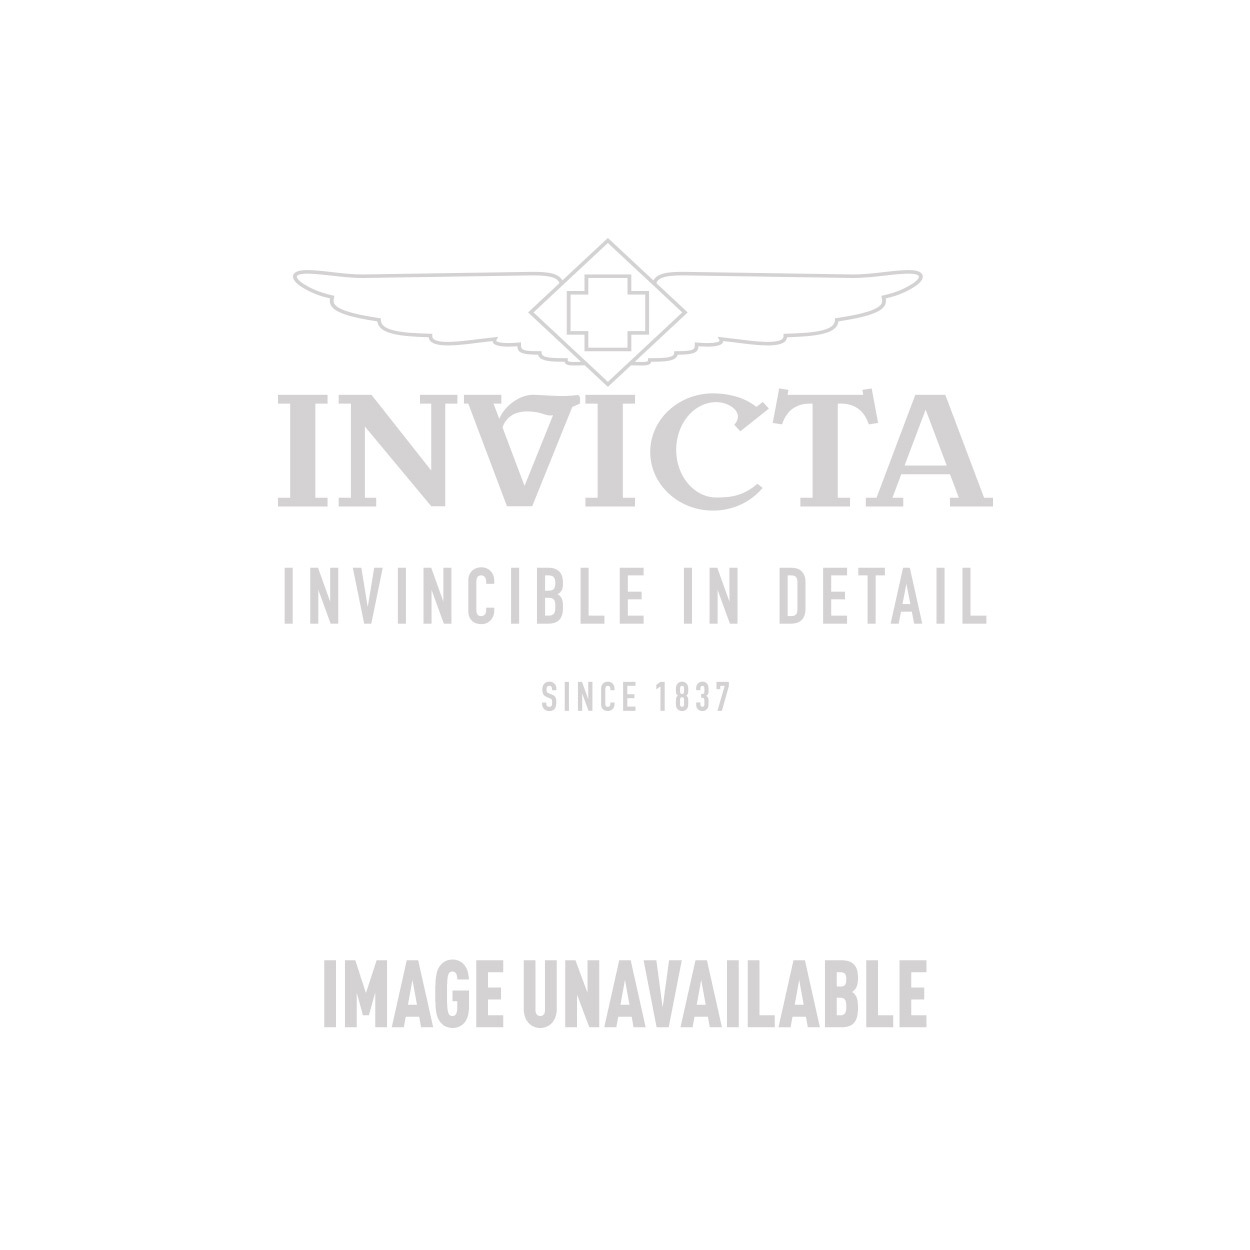 Invicta Lupah Quartz Watch - Gold, Stainless Steel case with Steel, Gold tone Stainless Steel band - Model 15853